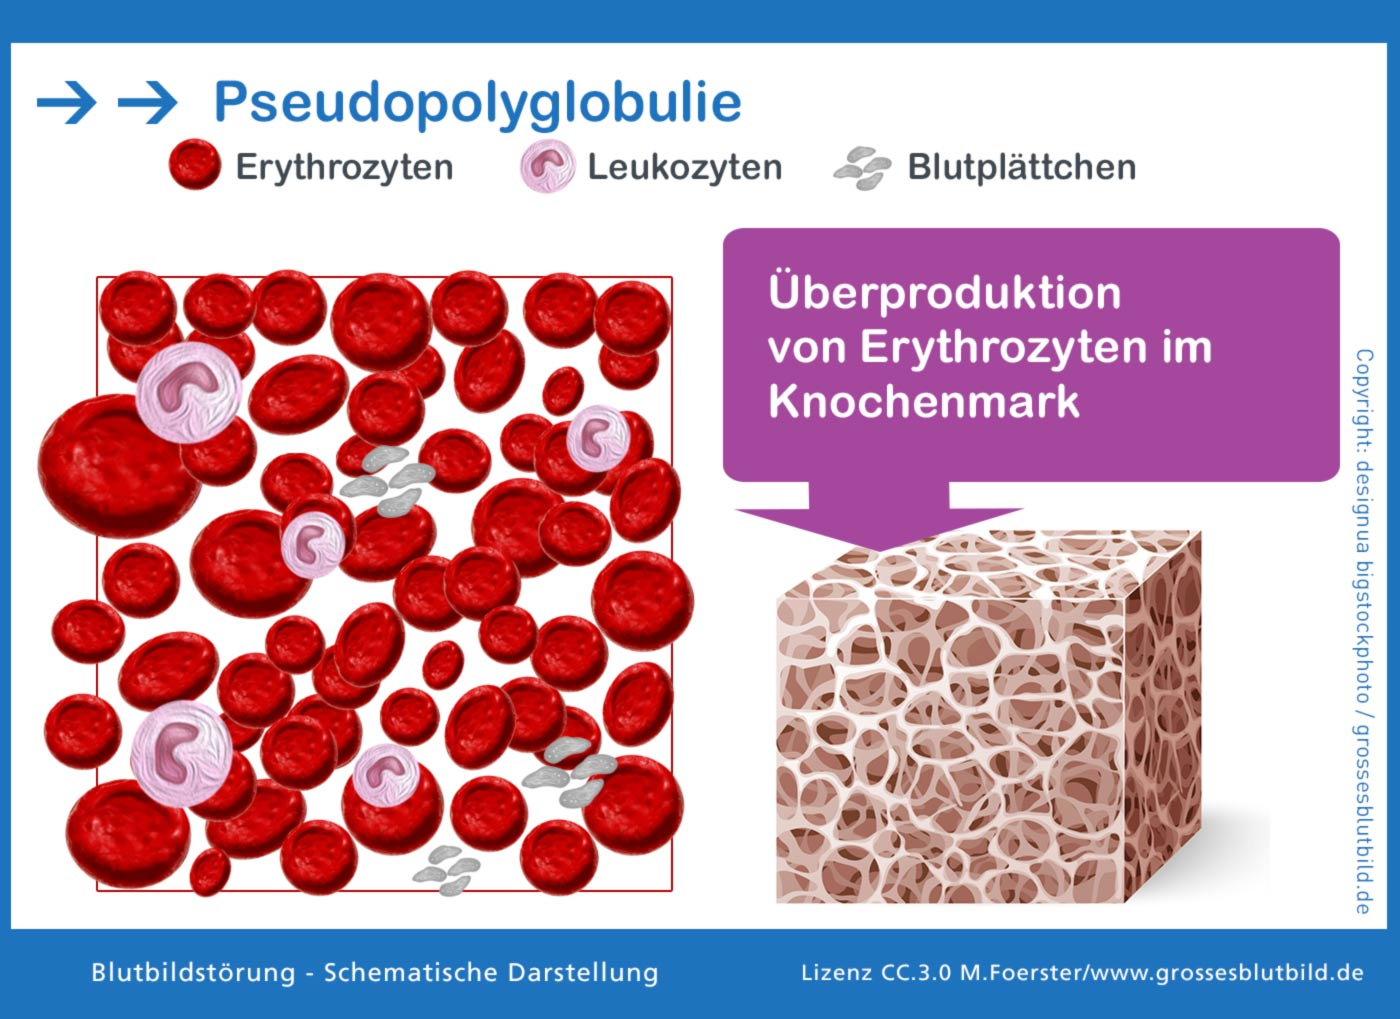 Polyglobulie oder Erythrozytose